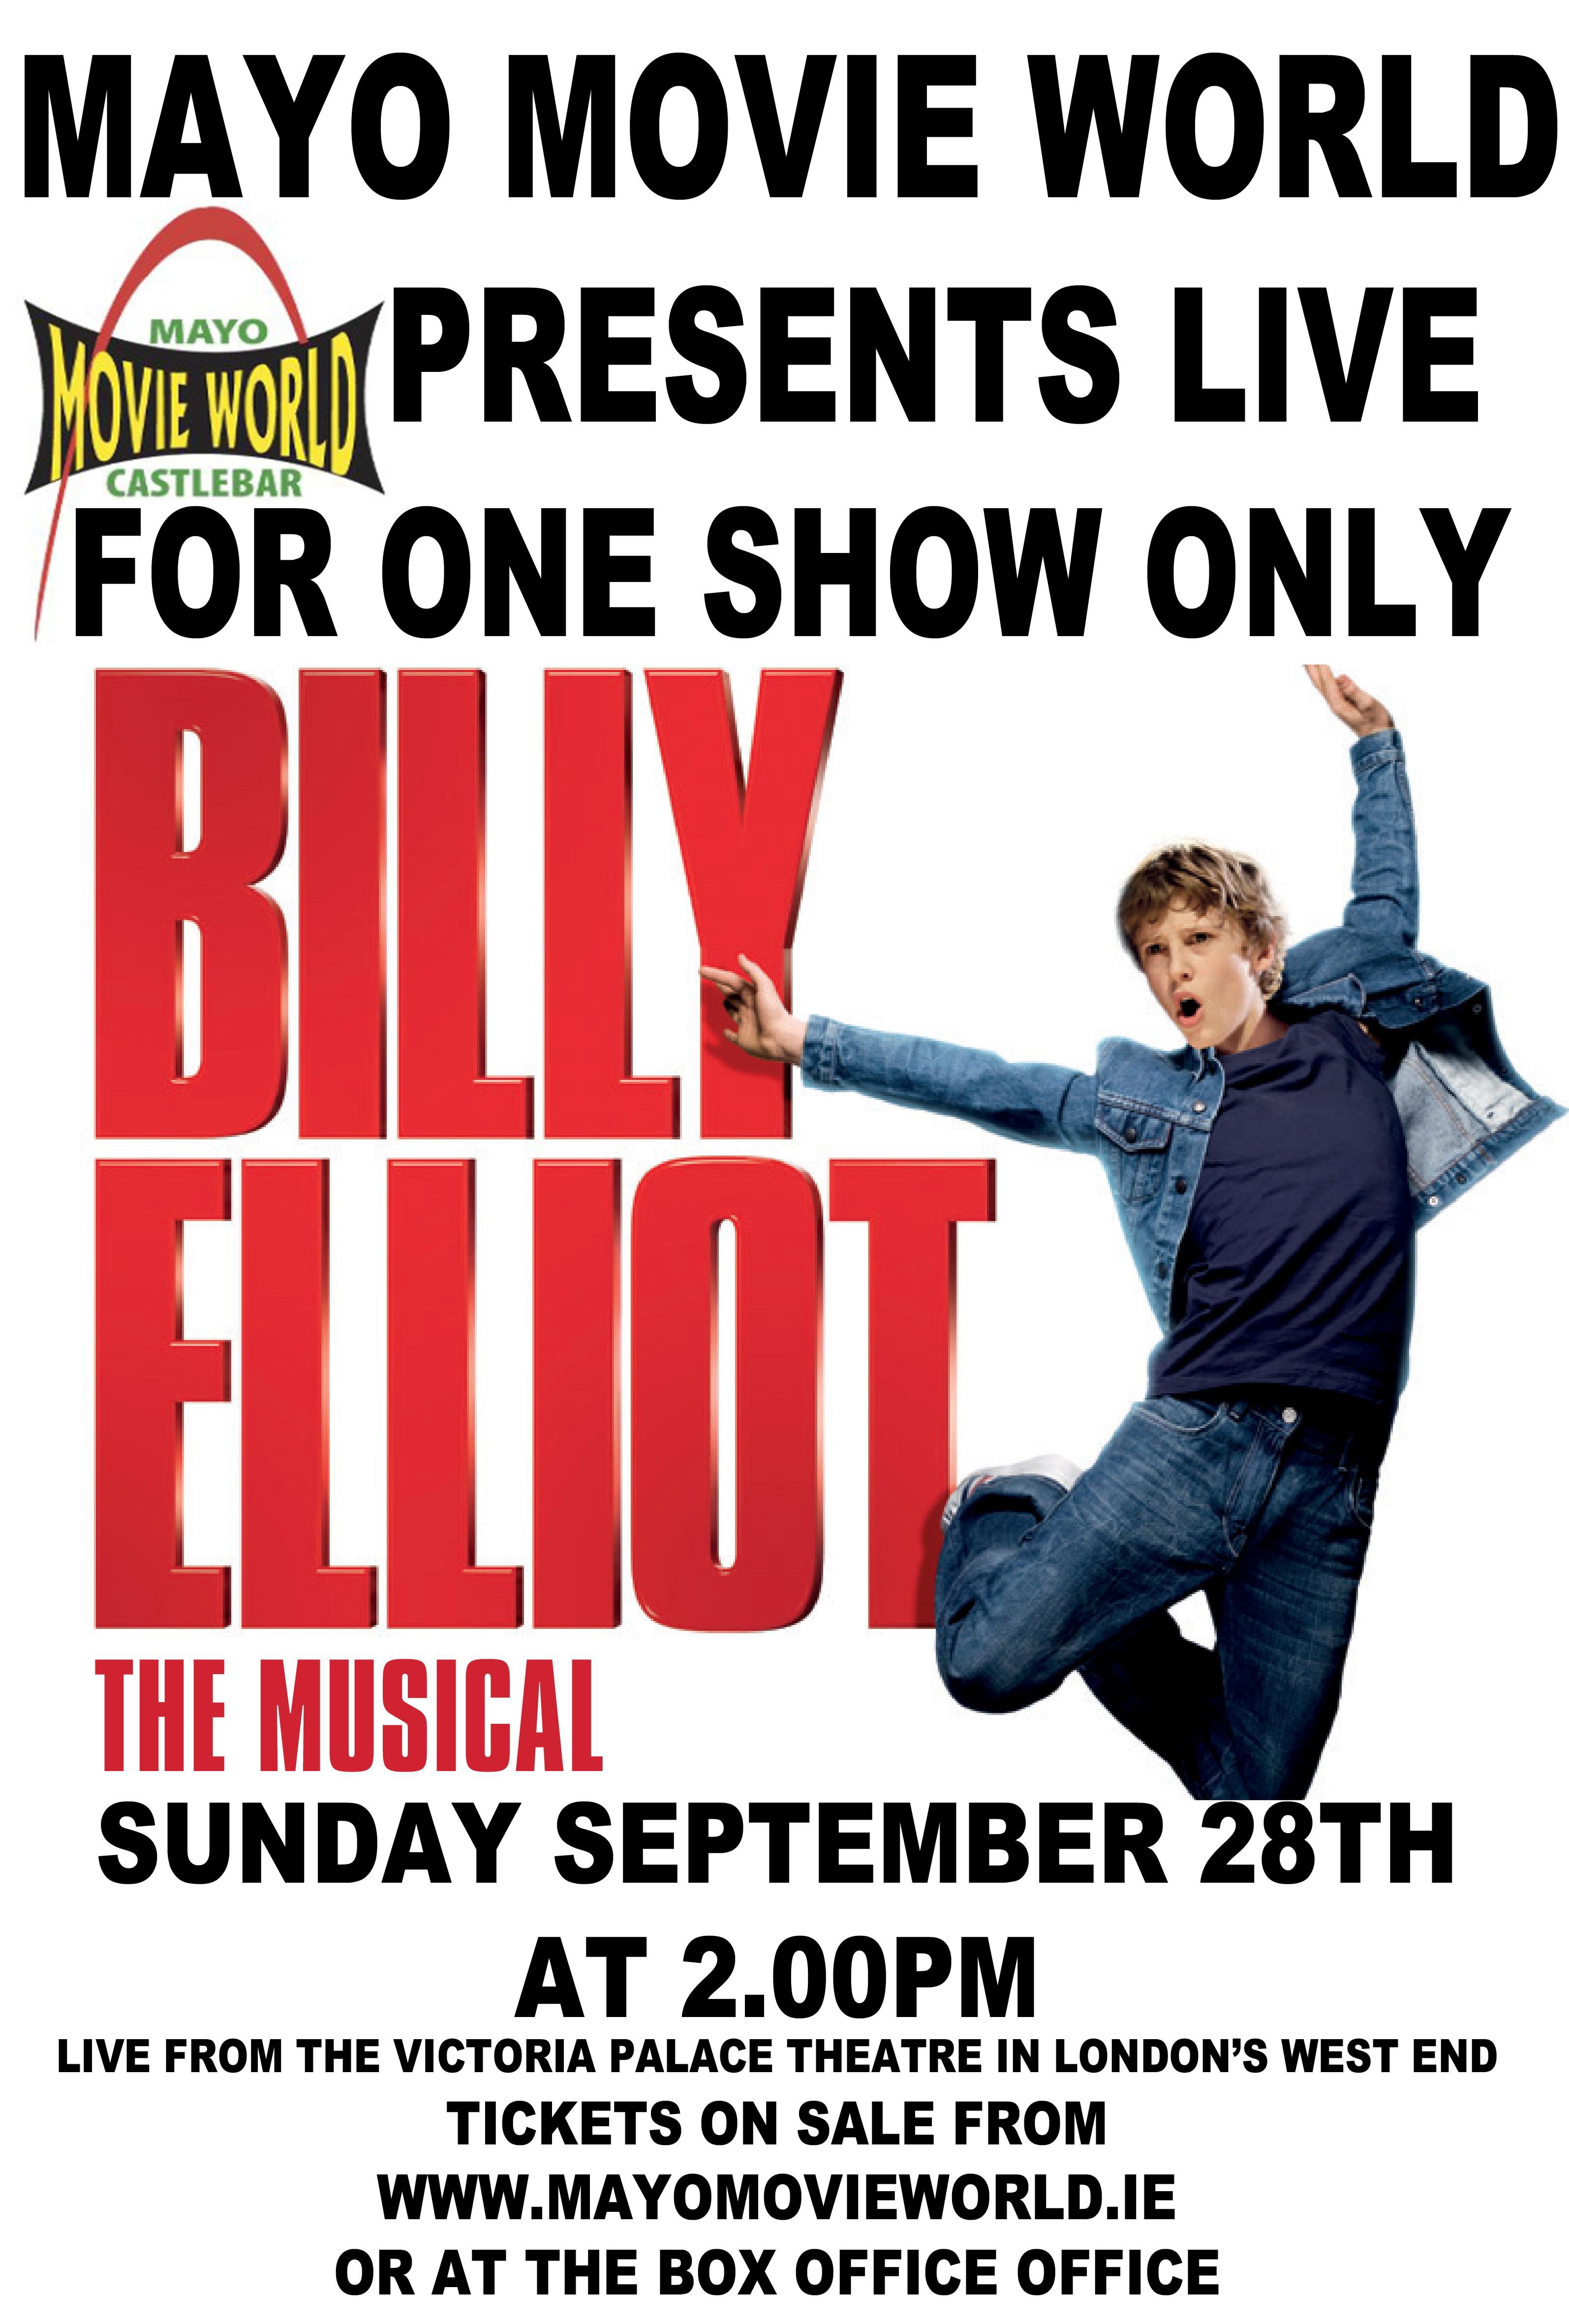 Billy_Elliot_Paper_Ad_1.jpg